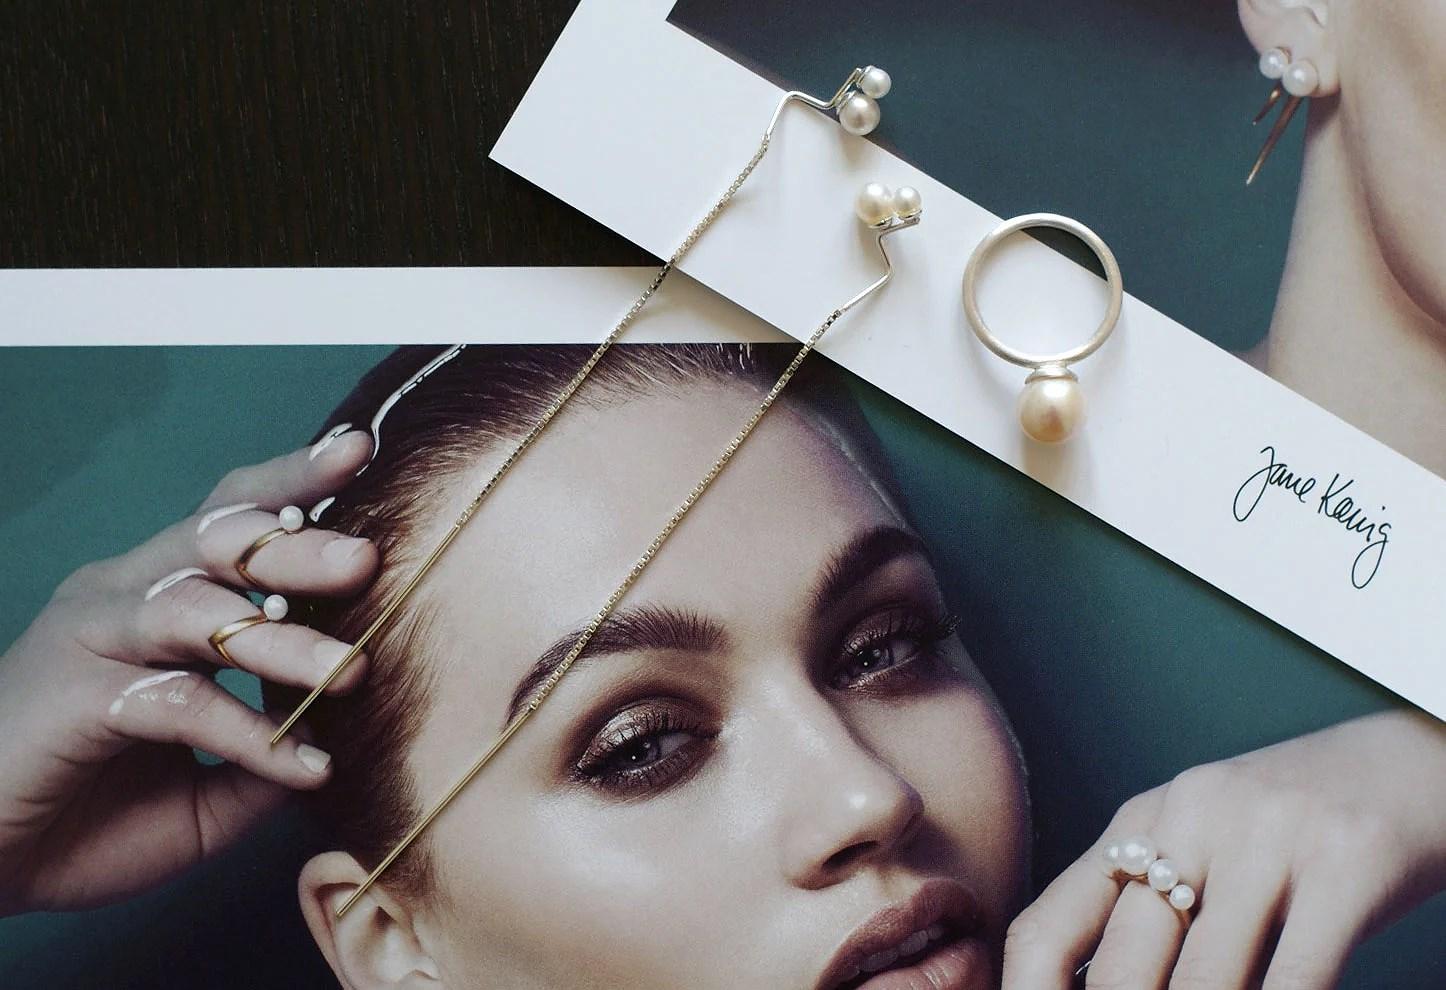 Janekoenig-perlesmykker-perletrend-itsmypassions